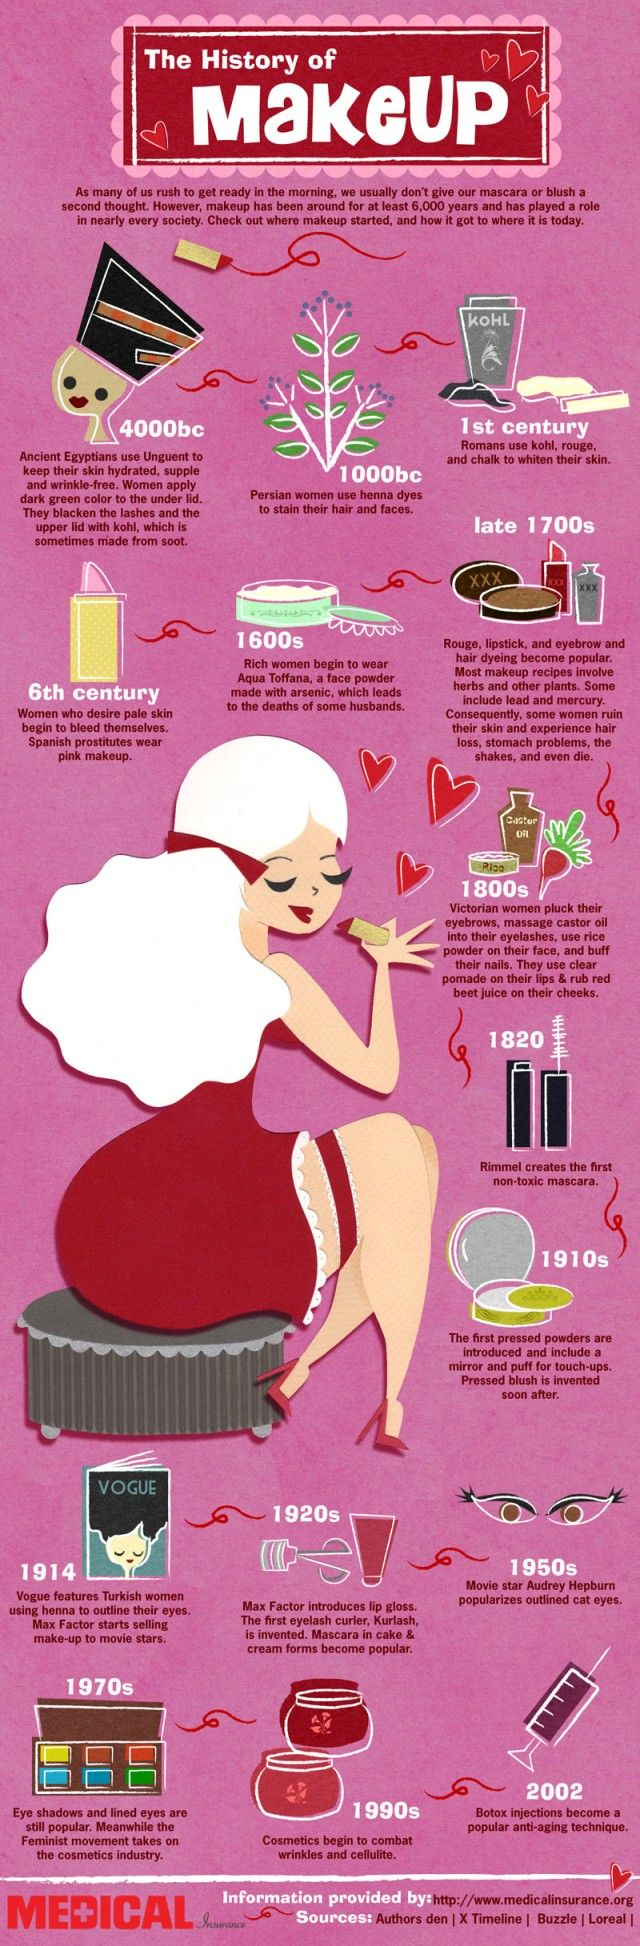 Brief & cute history of make up